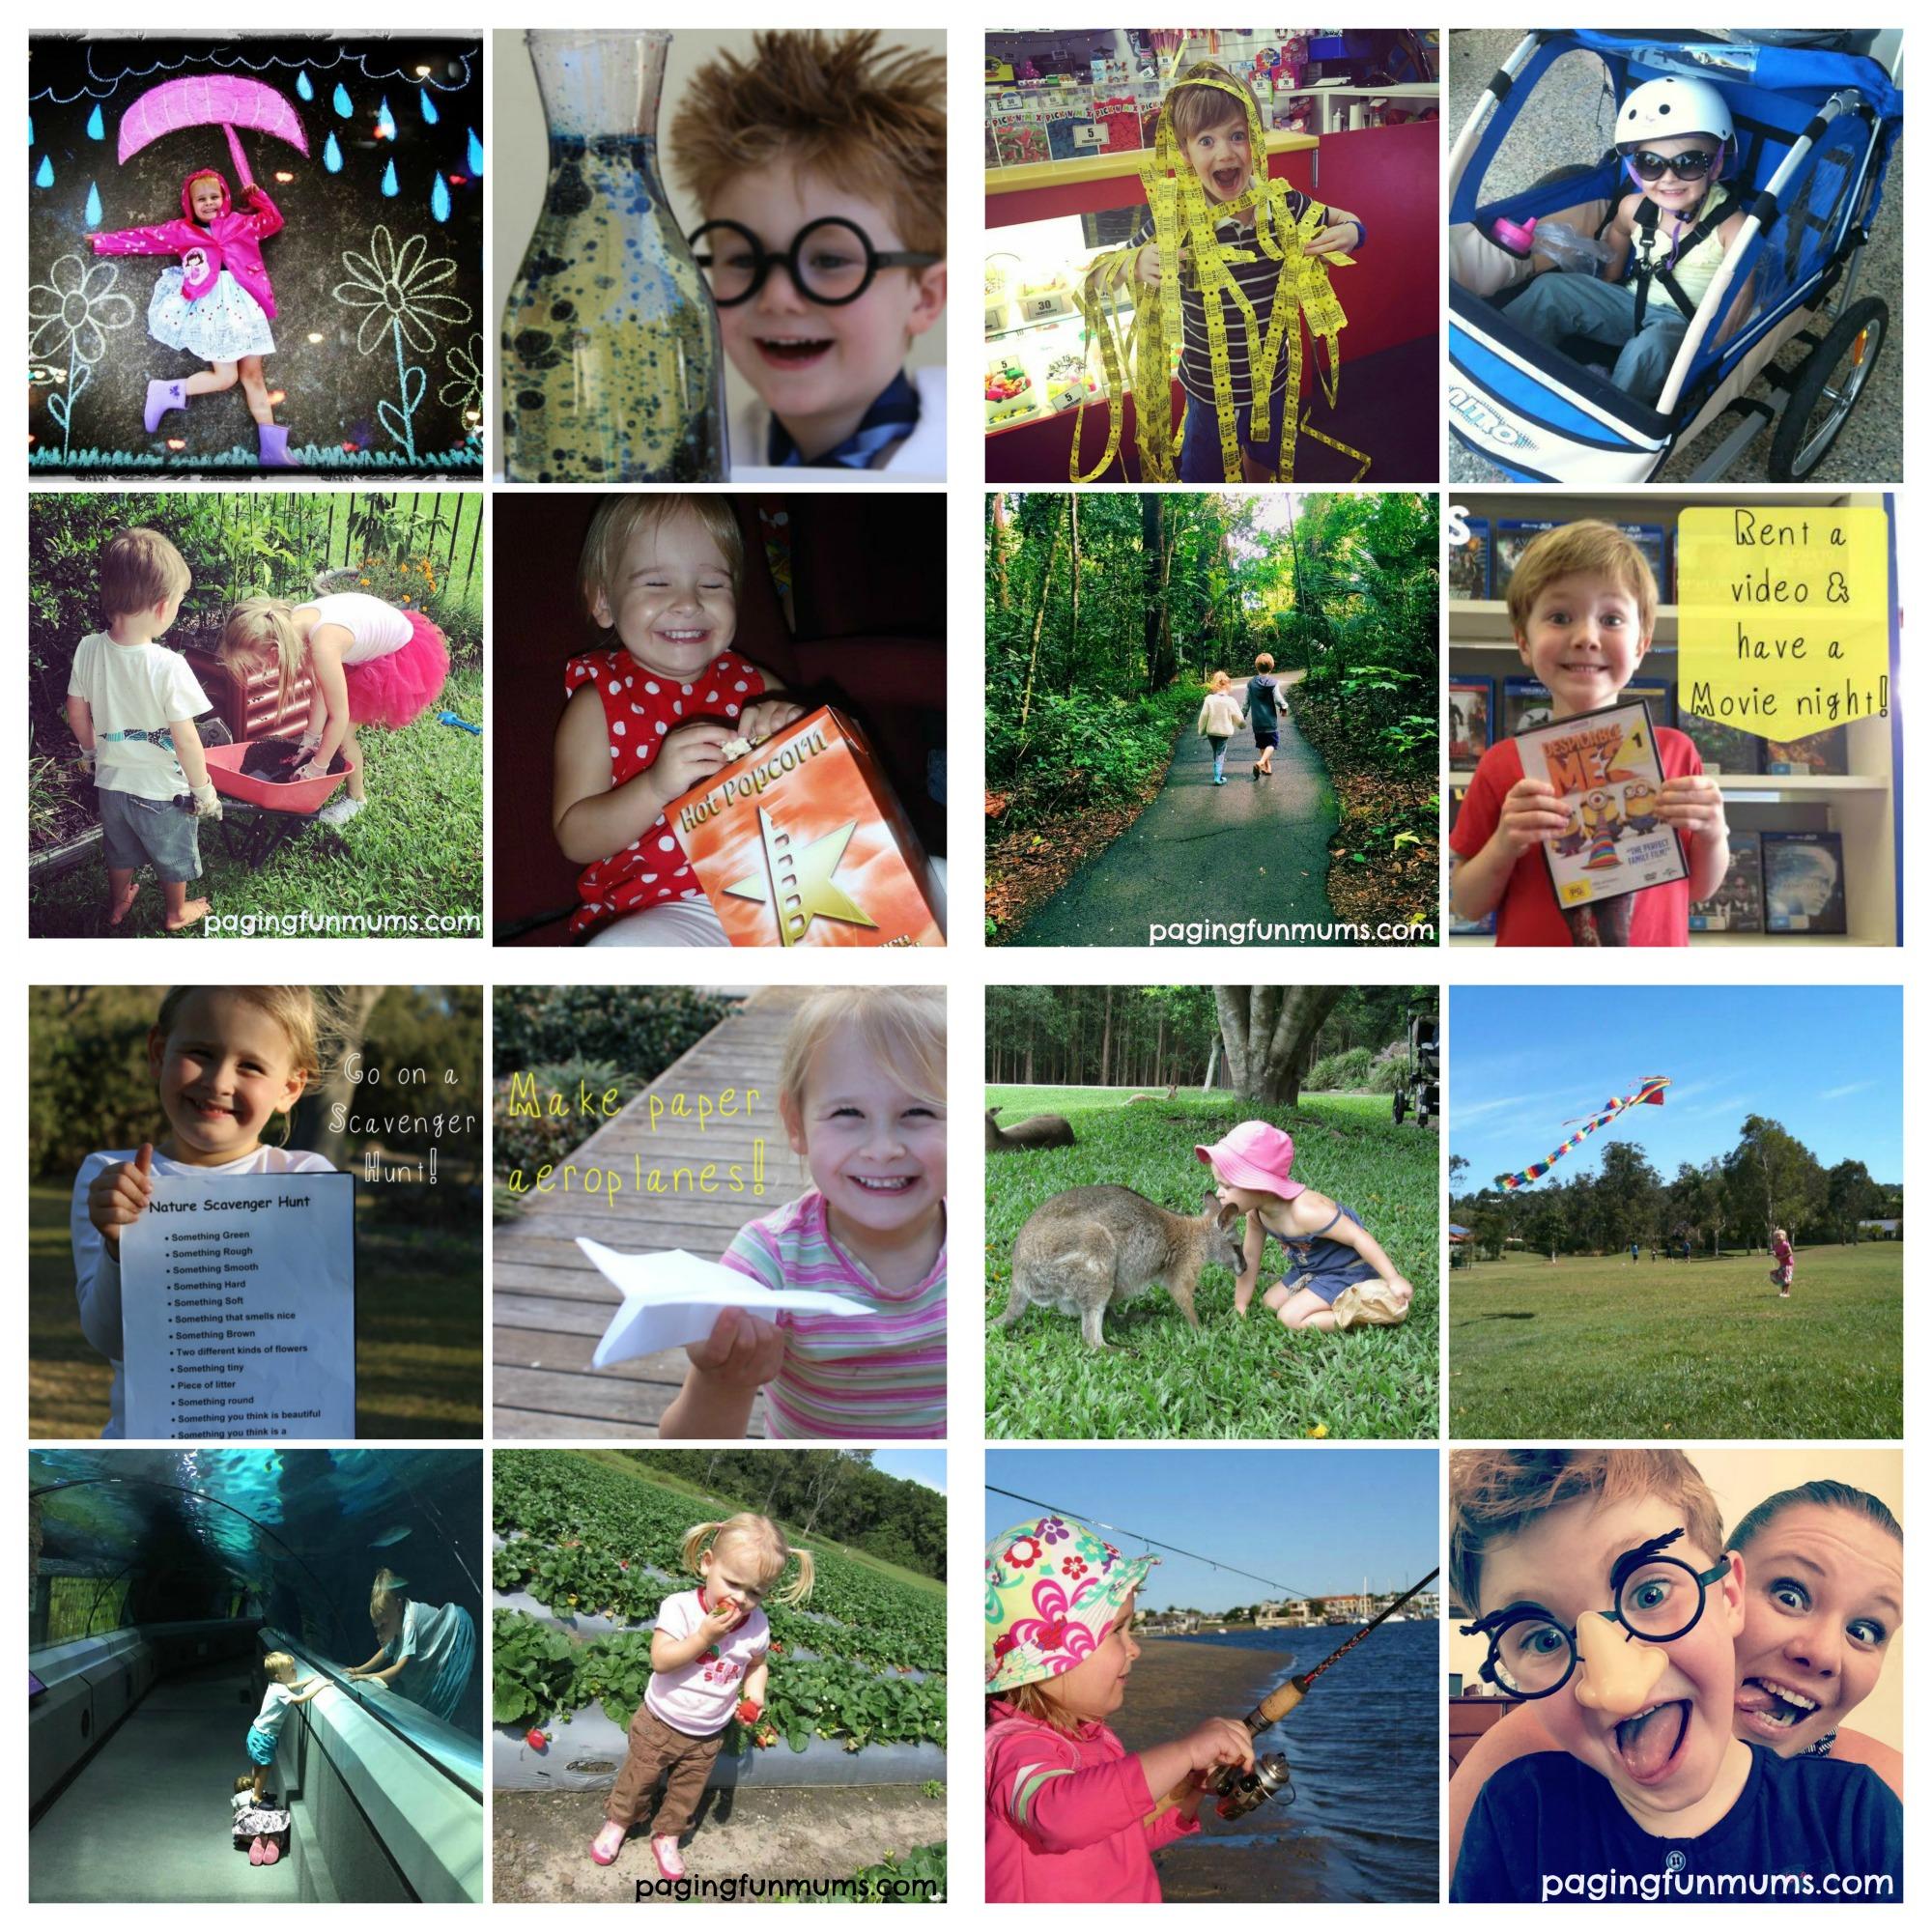 17 ways to Create Fun Family Memories